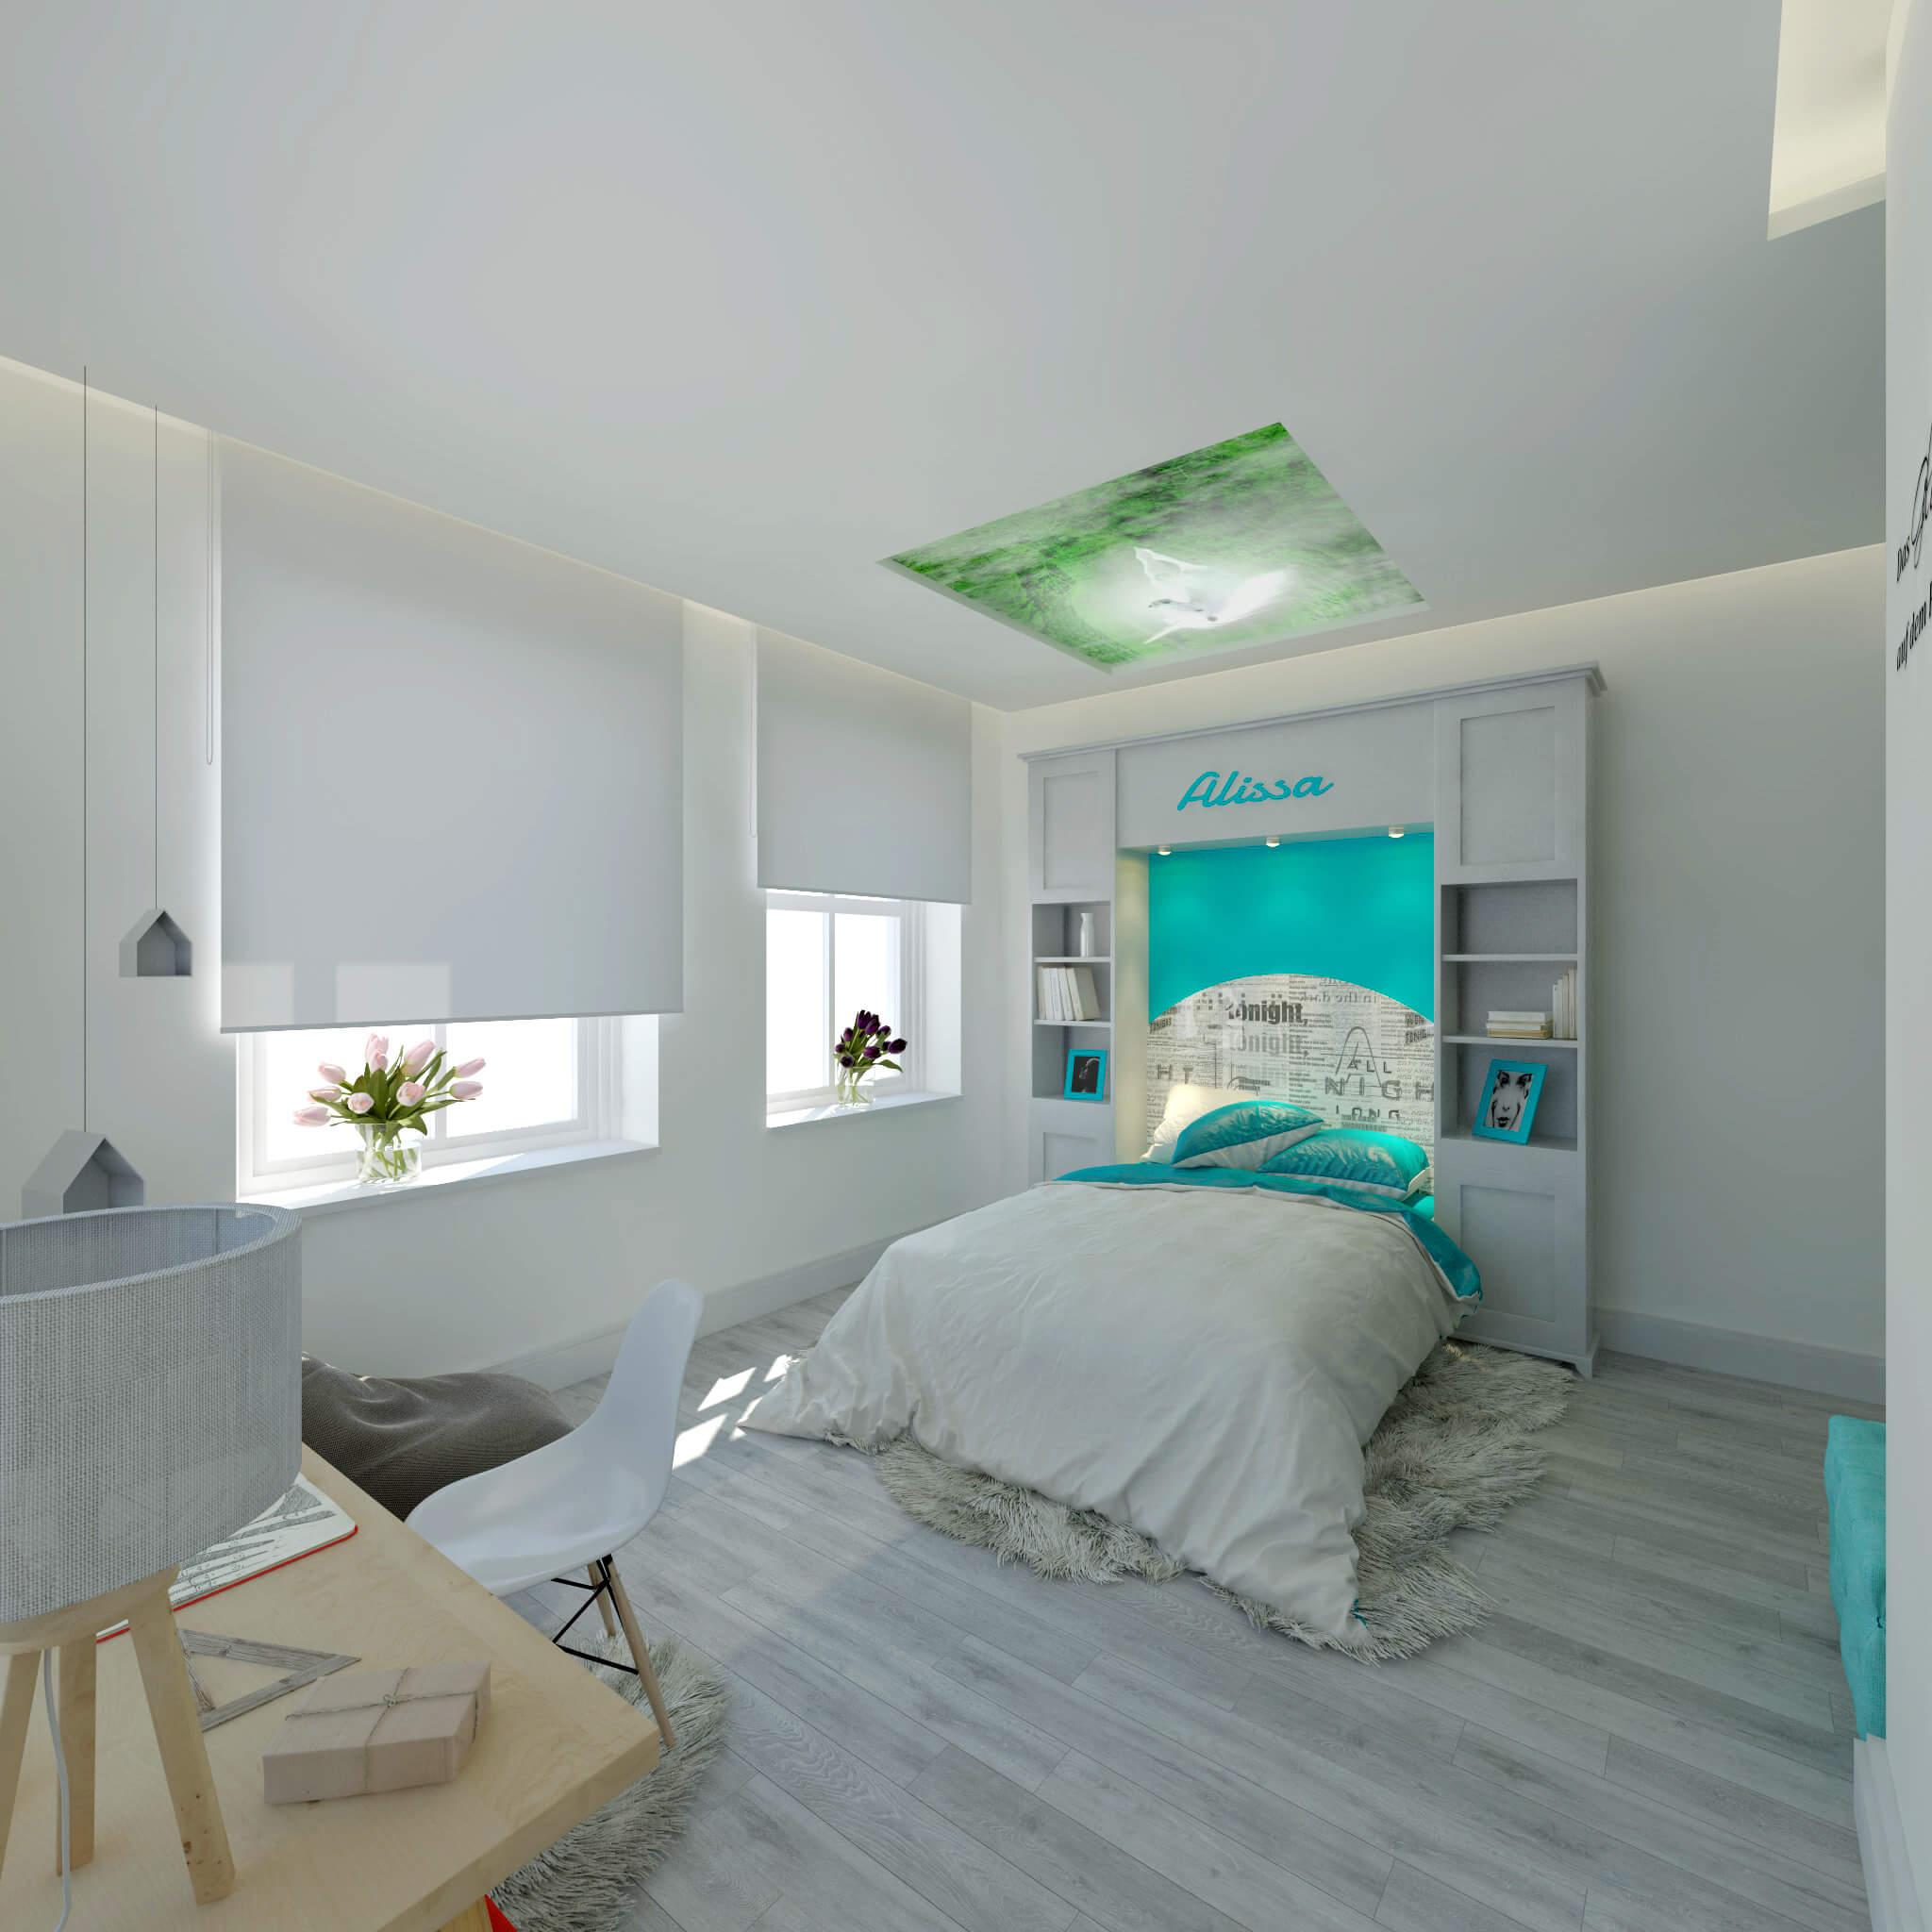 Jugendzimmer Design by Torsten Müller aus Bad Honnef nähe Köln Bonn Verkauf Beratung Planung Interior Designer 3D Lifestyle- (5)